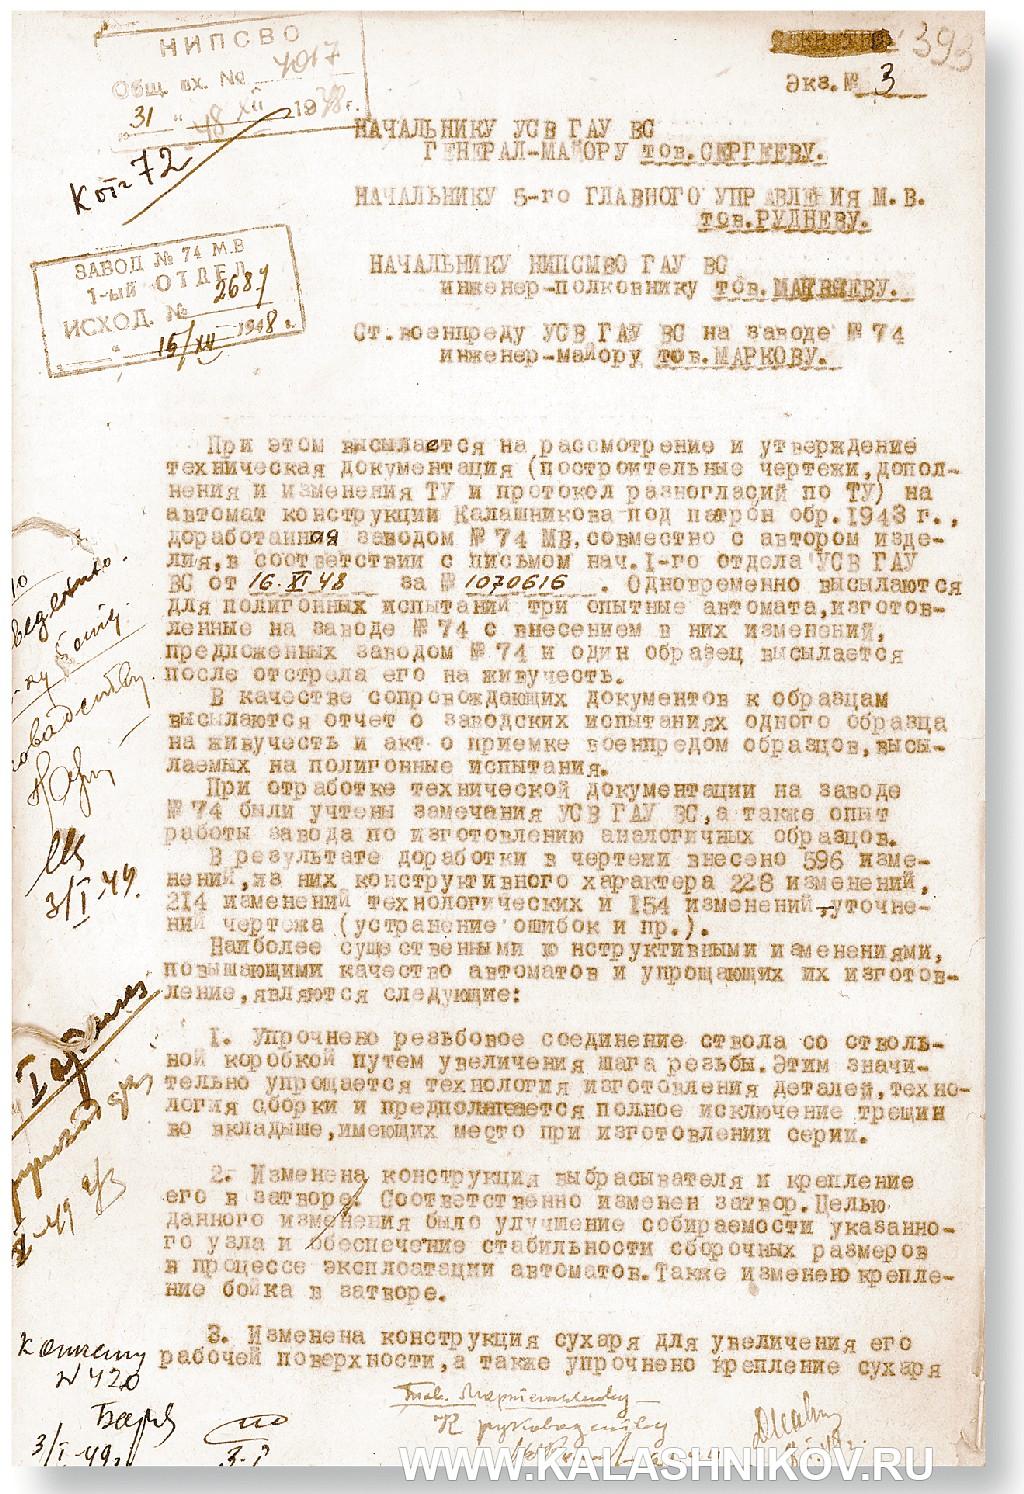 Страница из протокола работ по АК-47